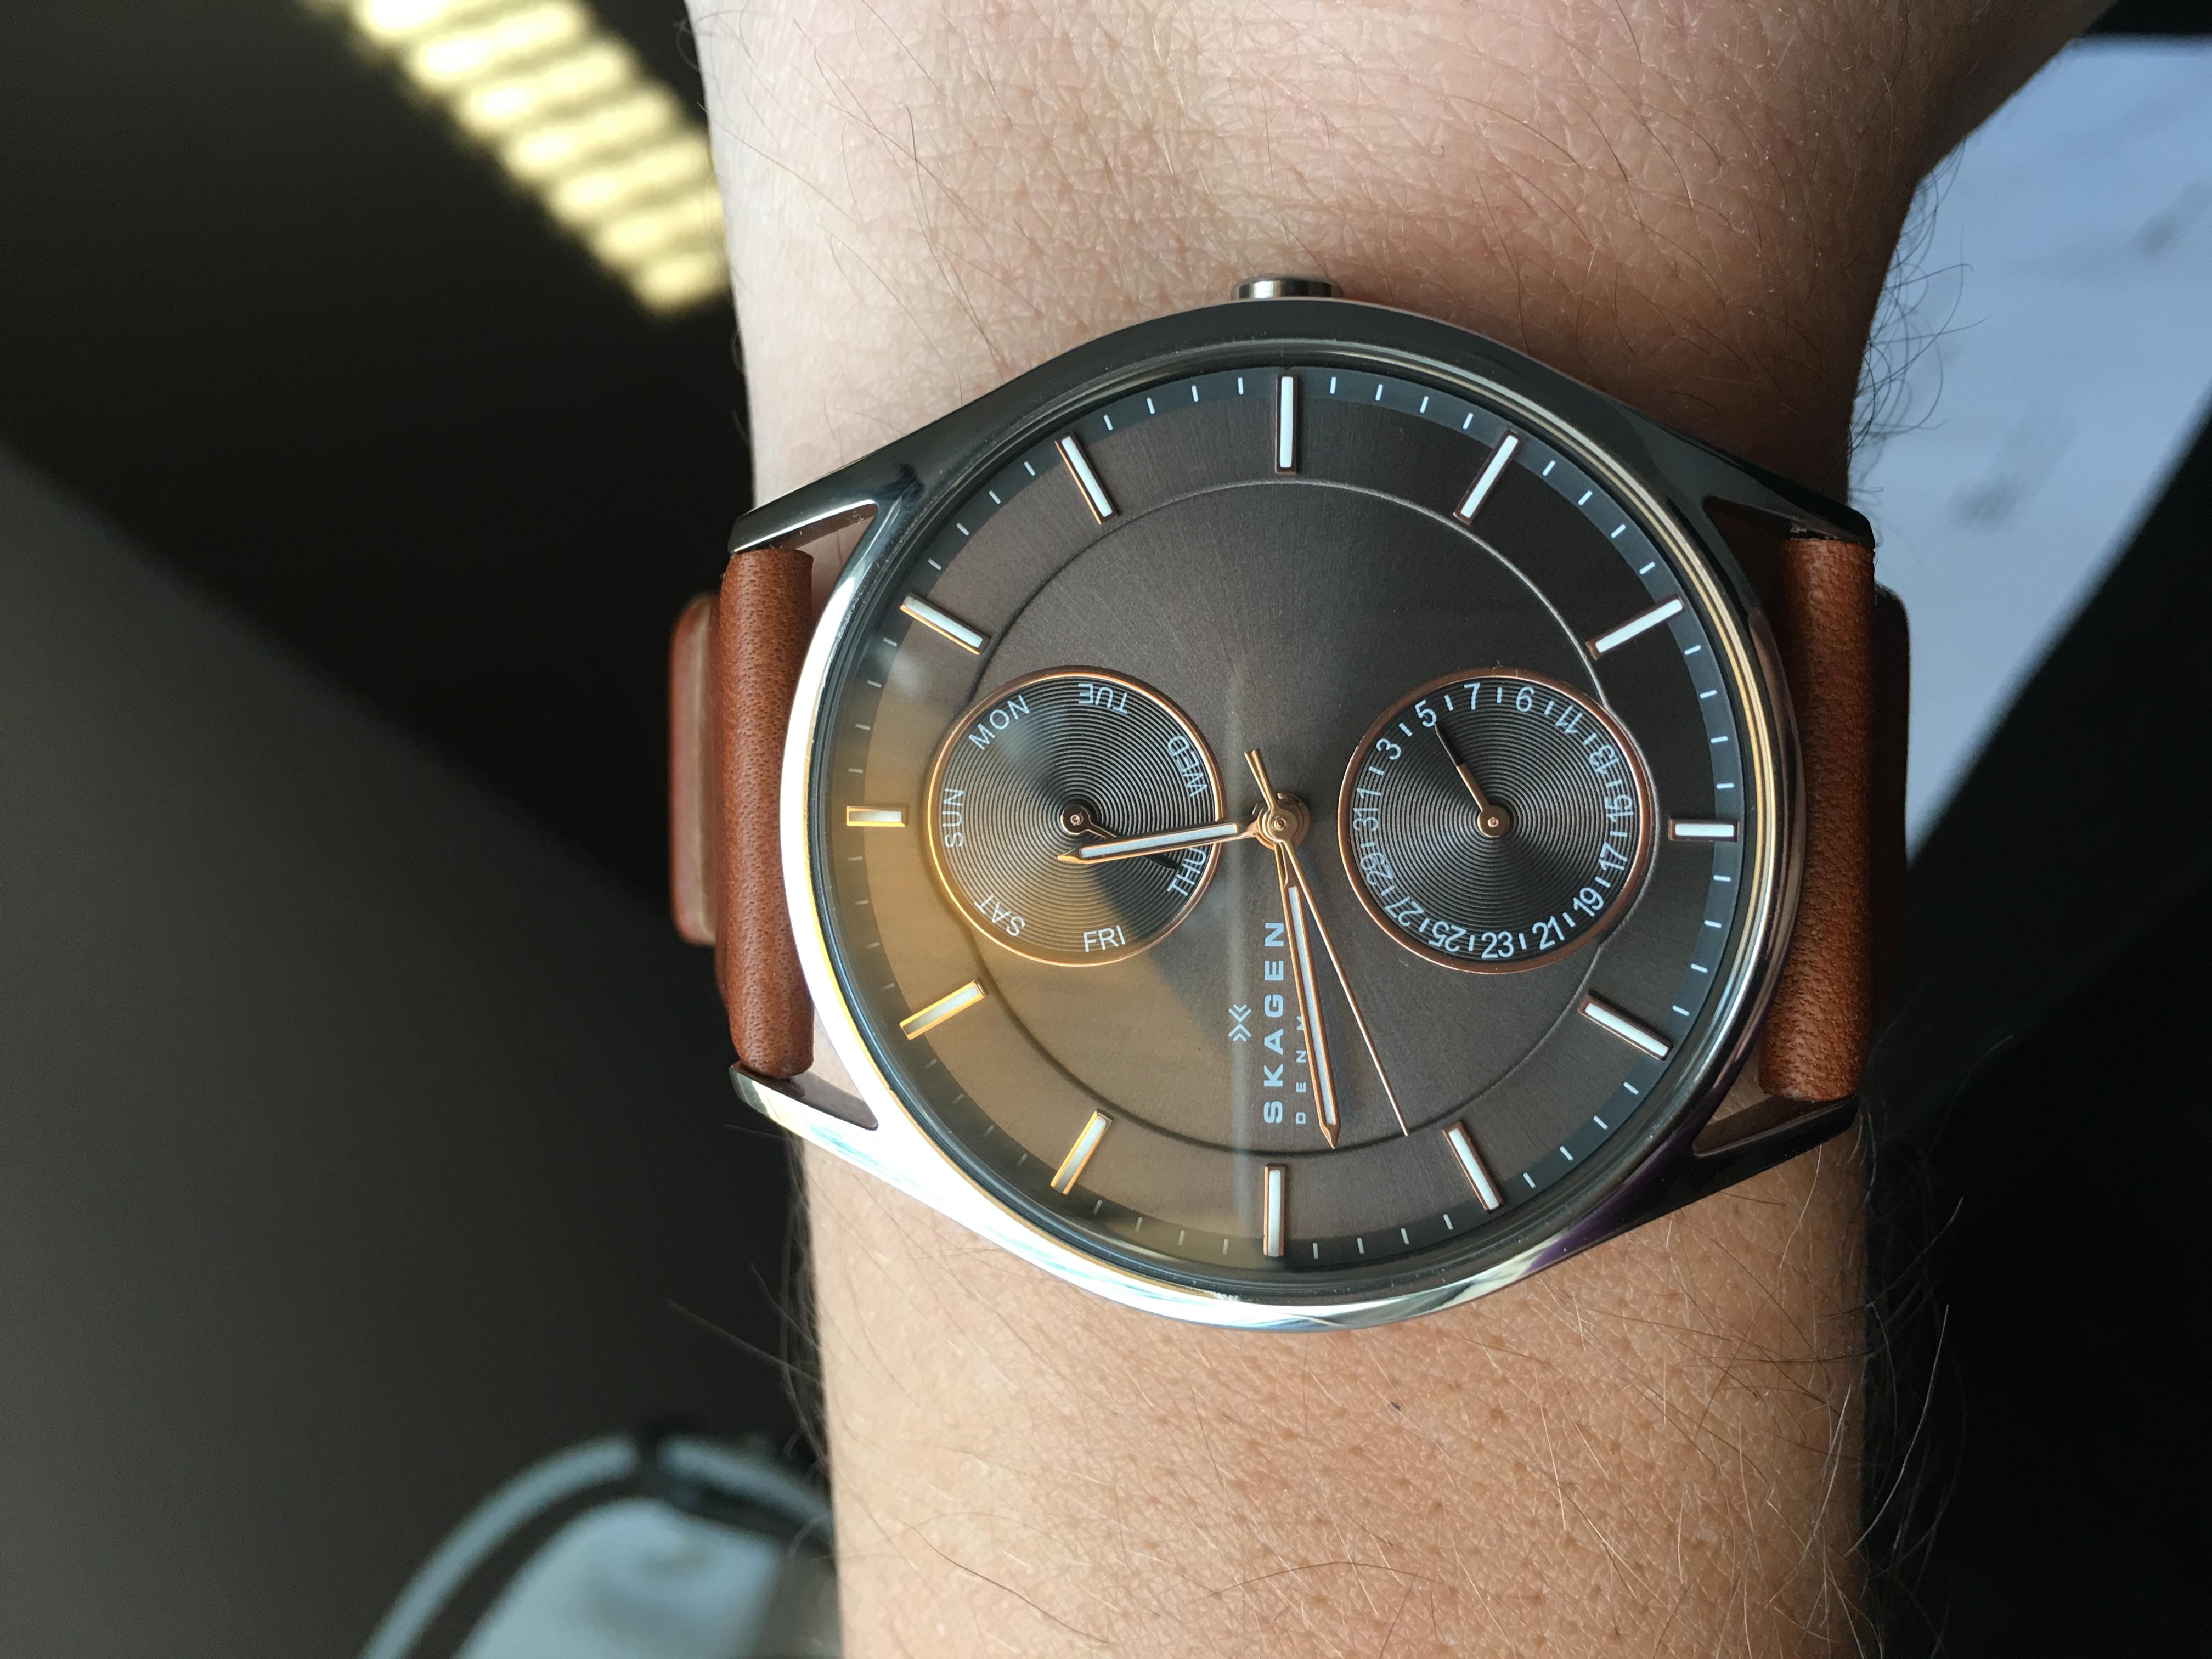 Skagen watch review uk dating